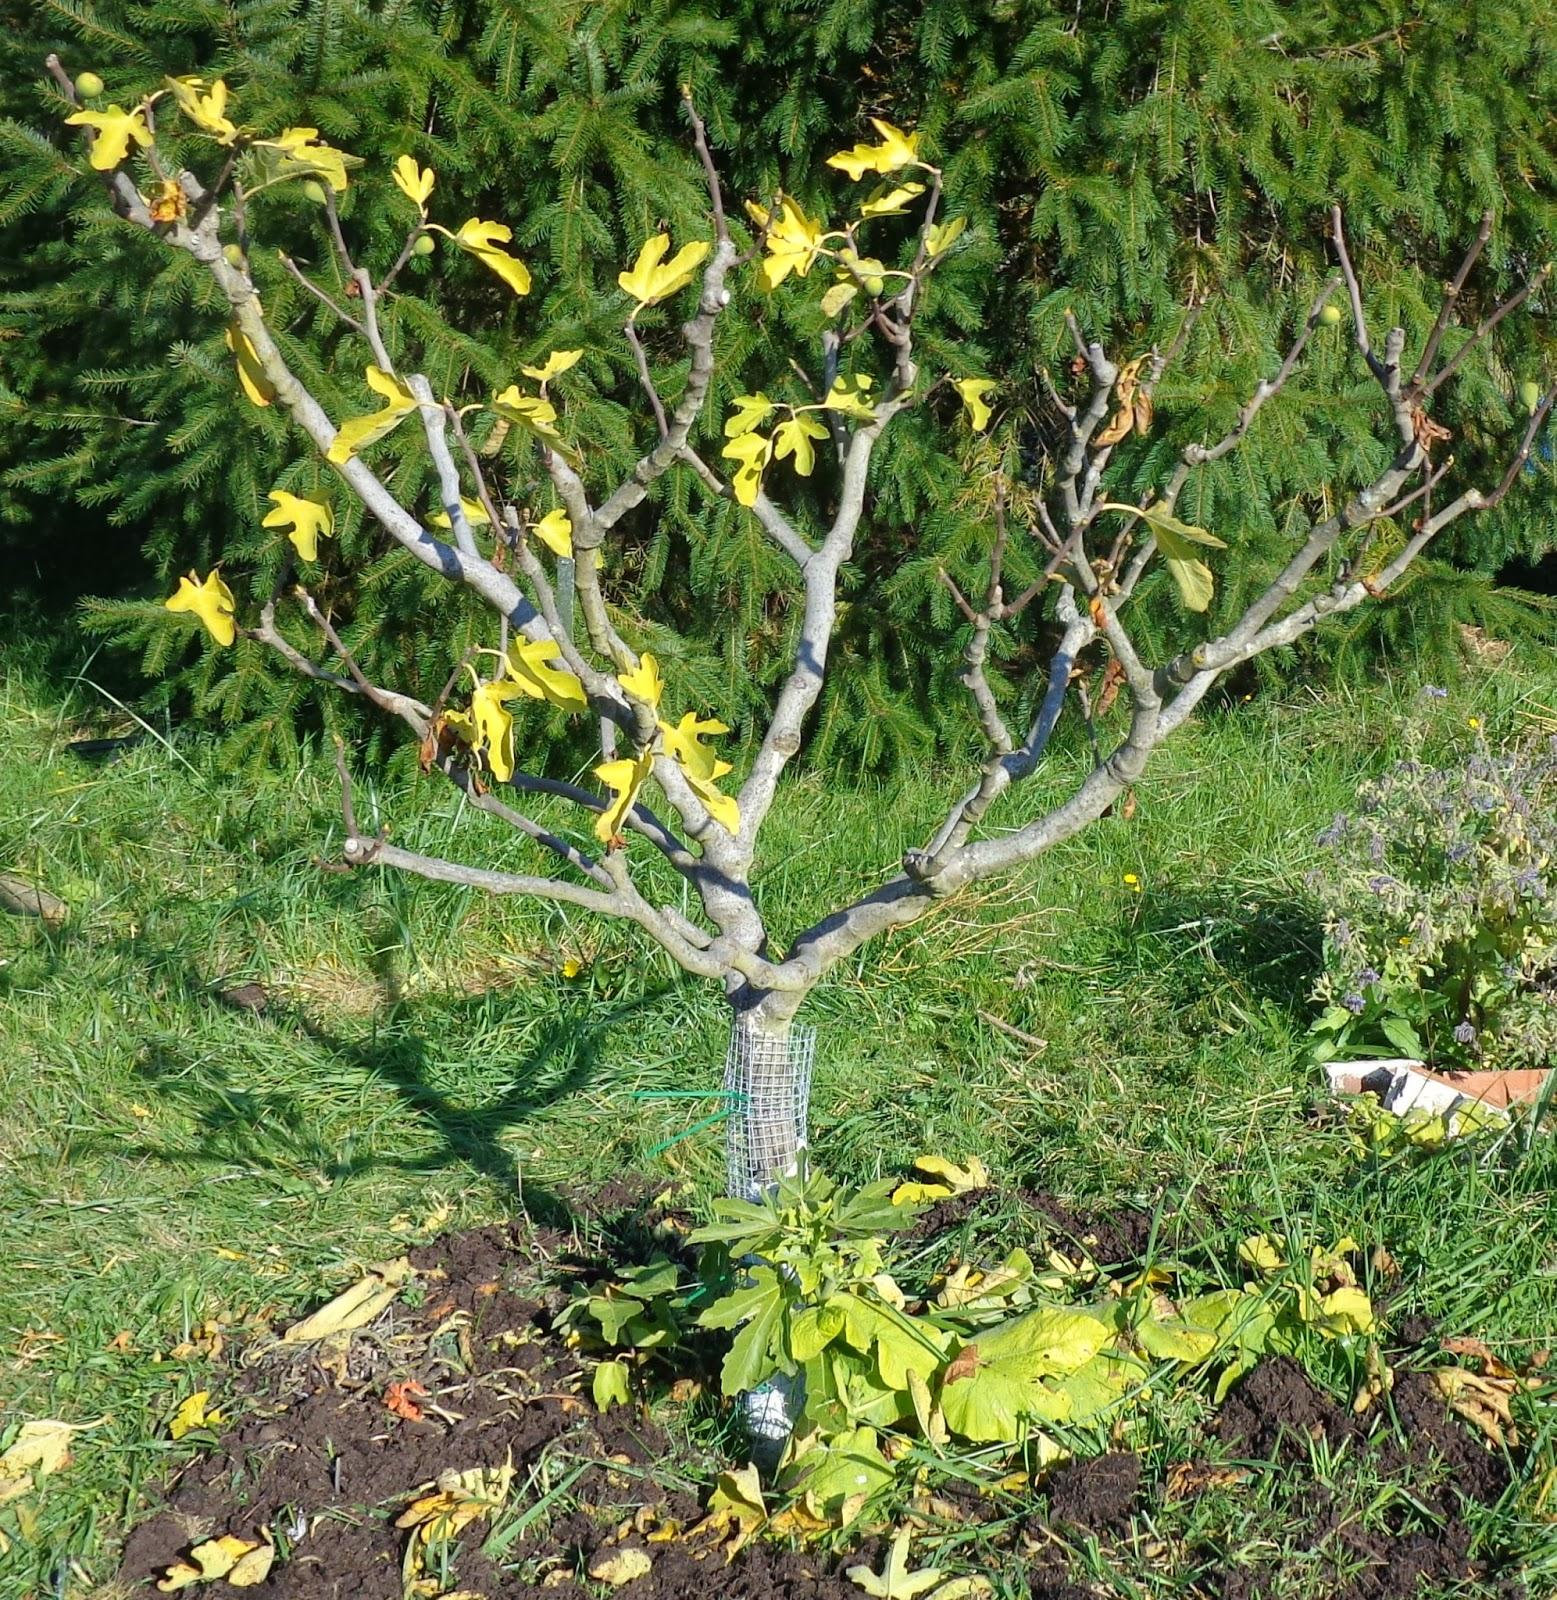 Growing Greener In The Pacific Northwest: October 2013